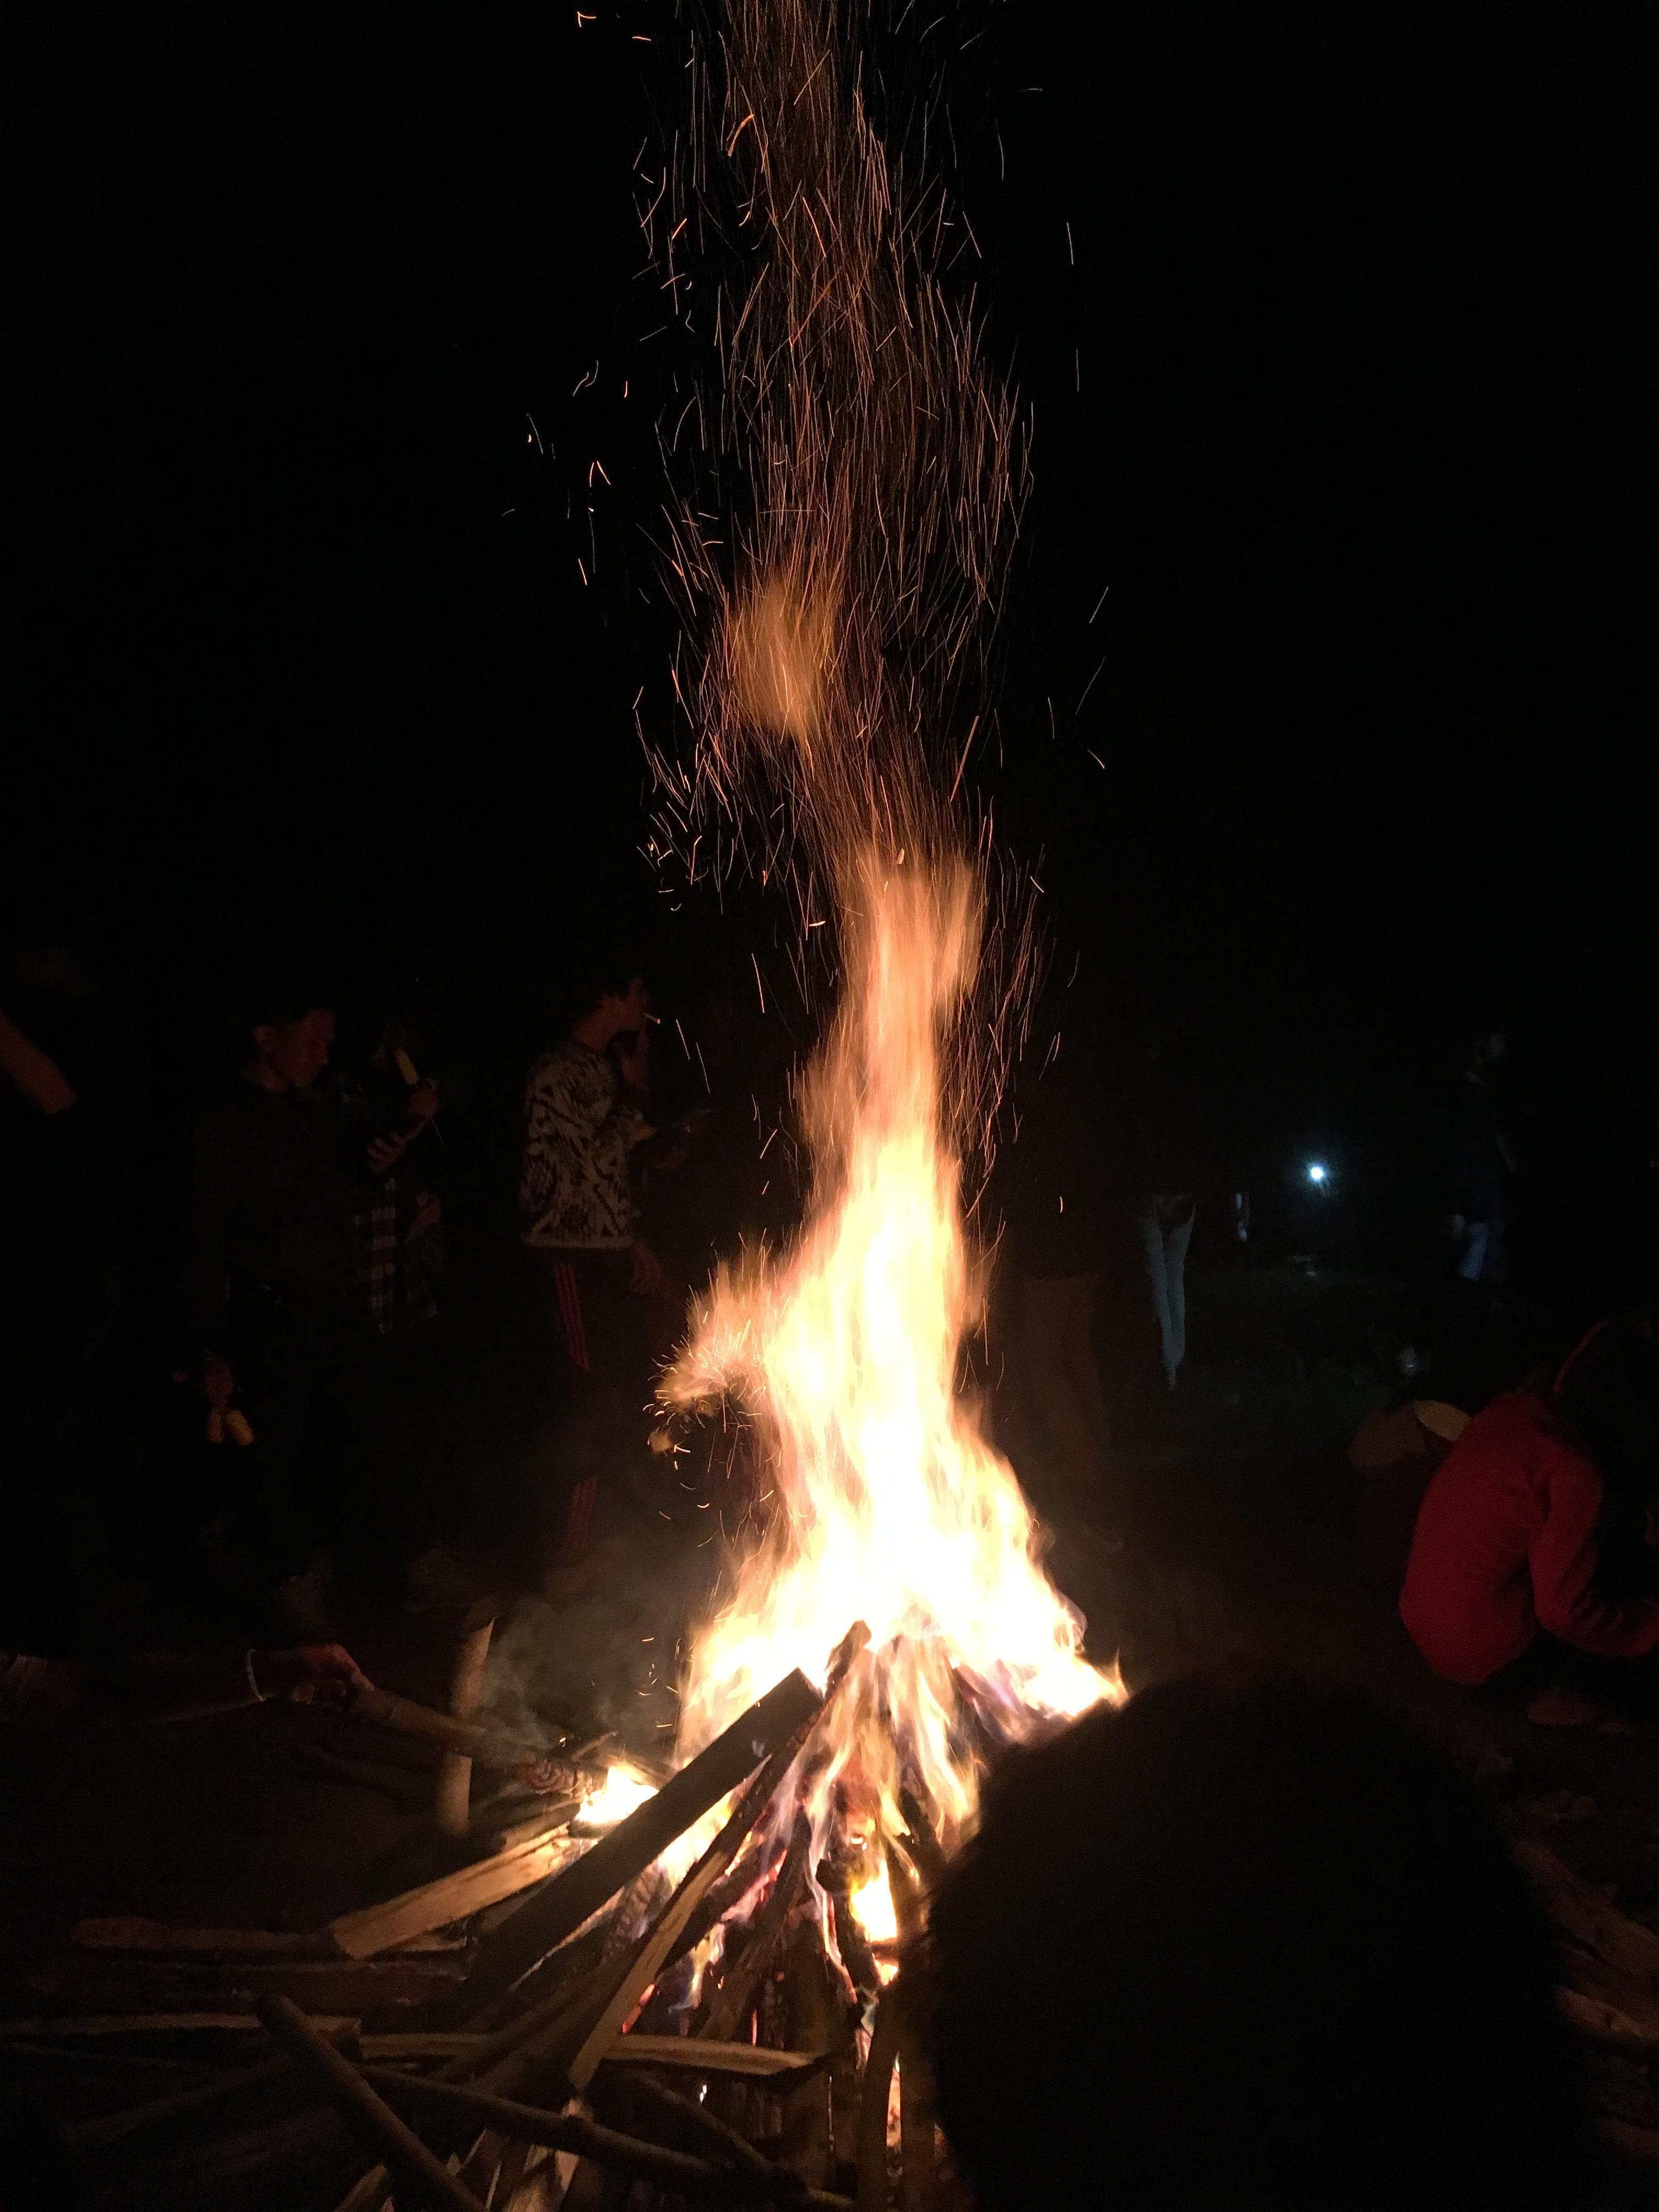 bonfire in the lastnight